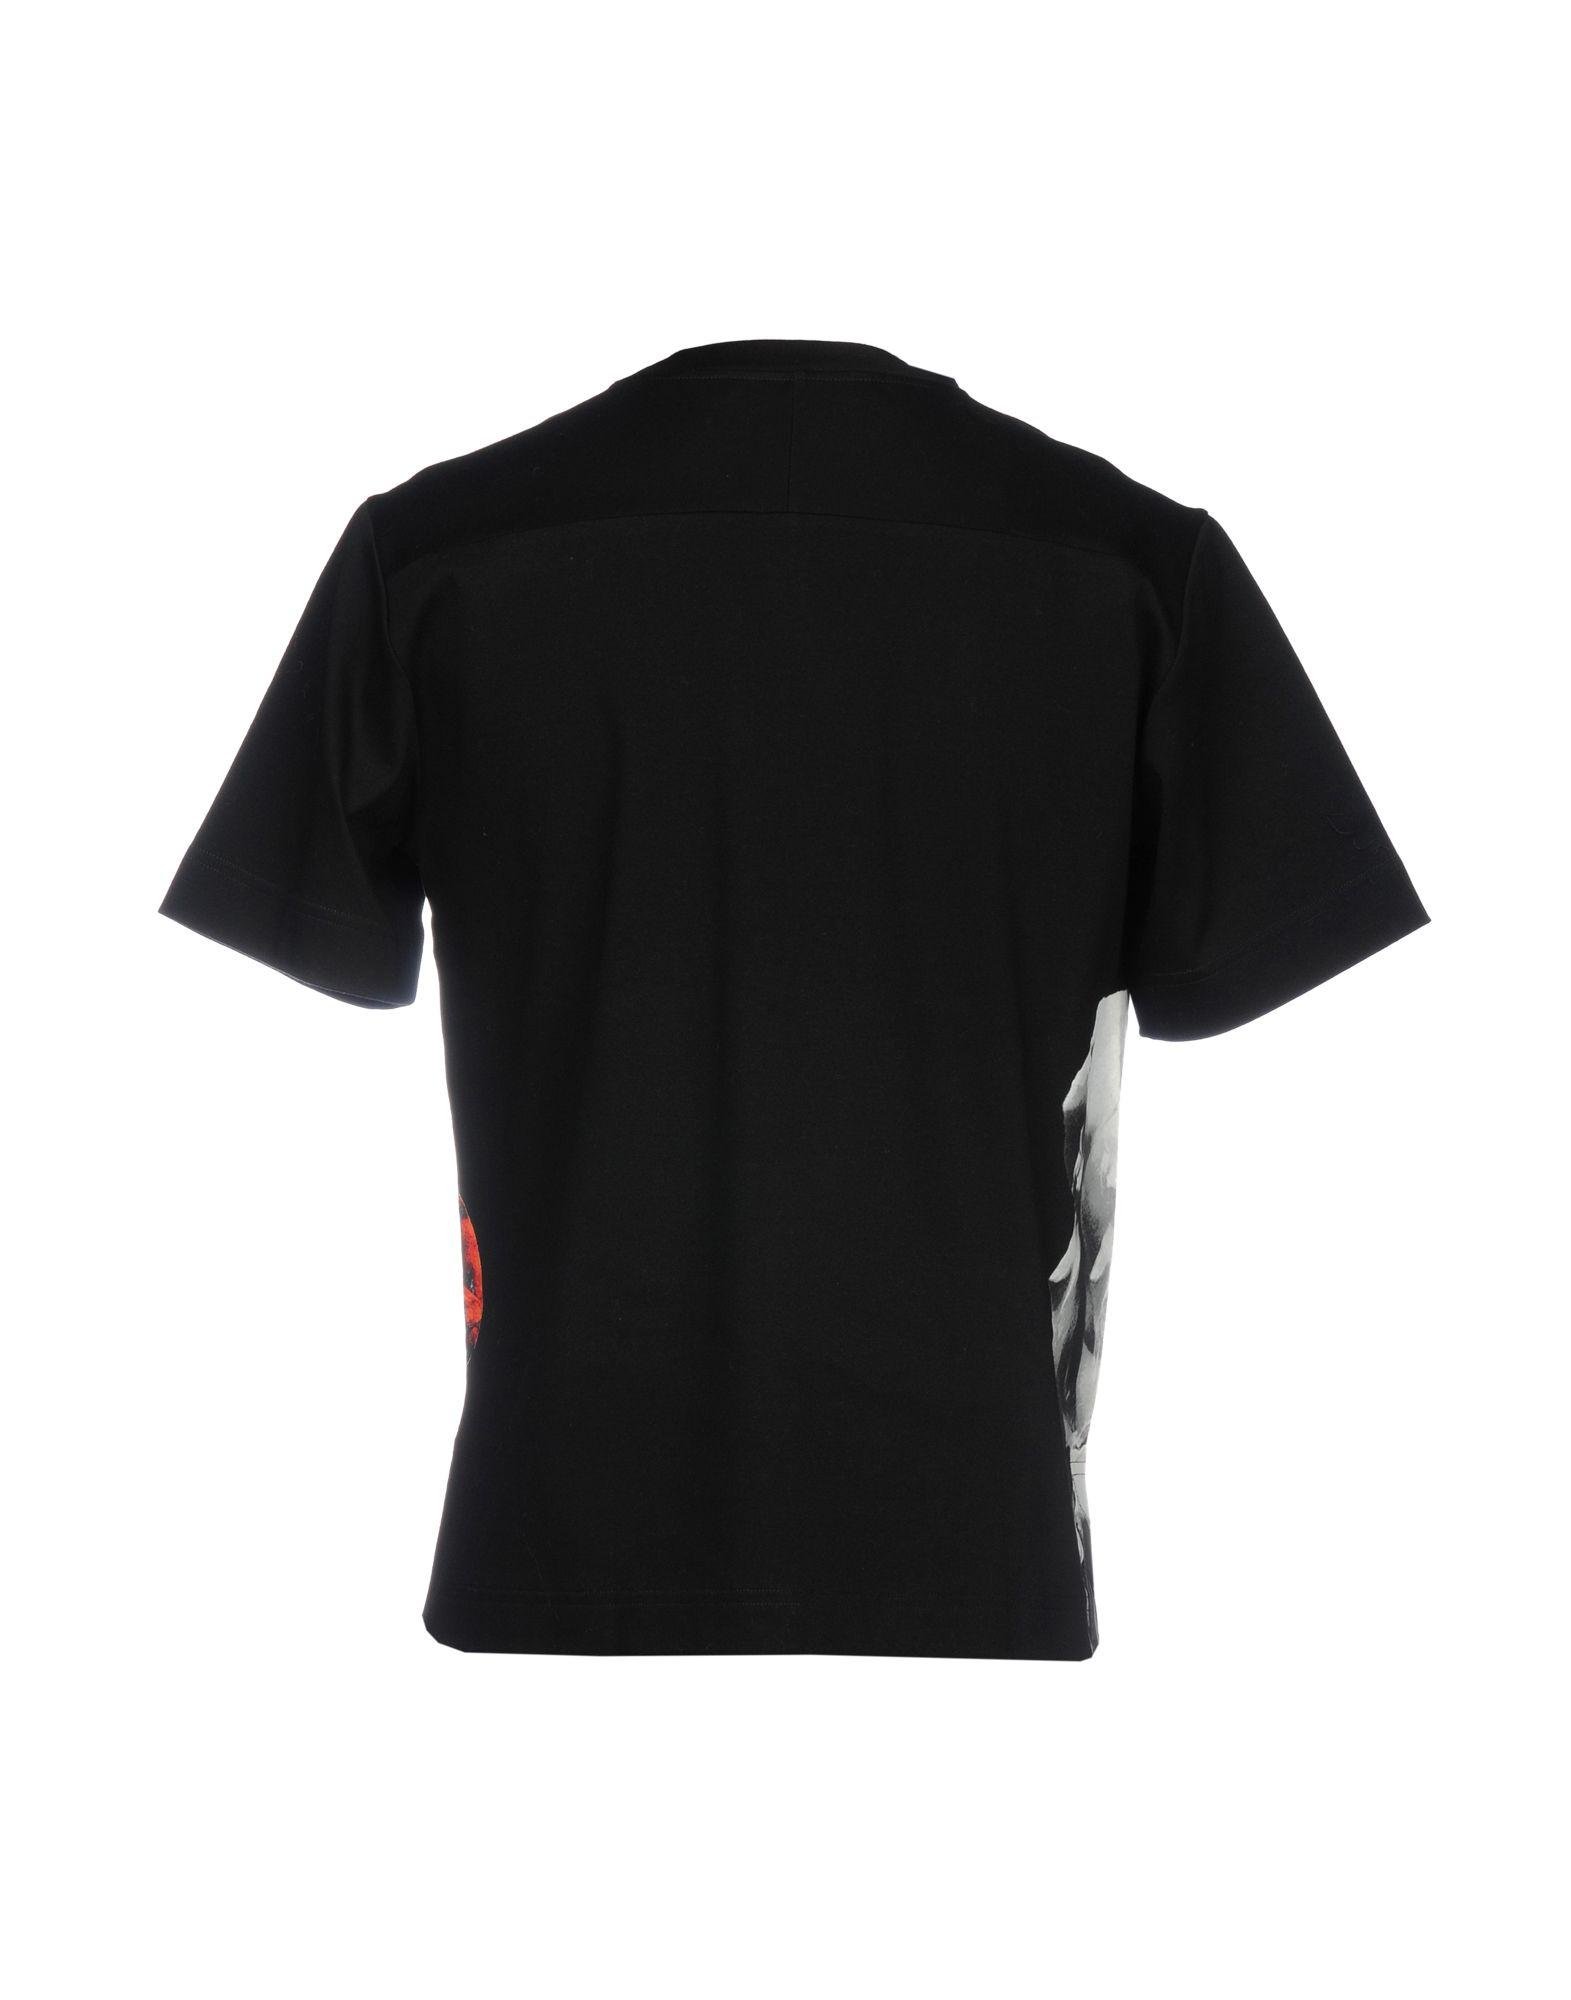 T-Shirt Proenza Uomo Schouler Uomo Proenza - 12145725GV aeae9c